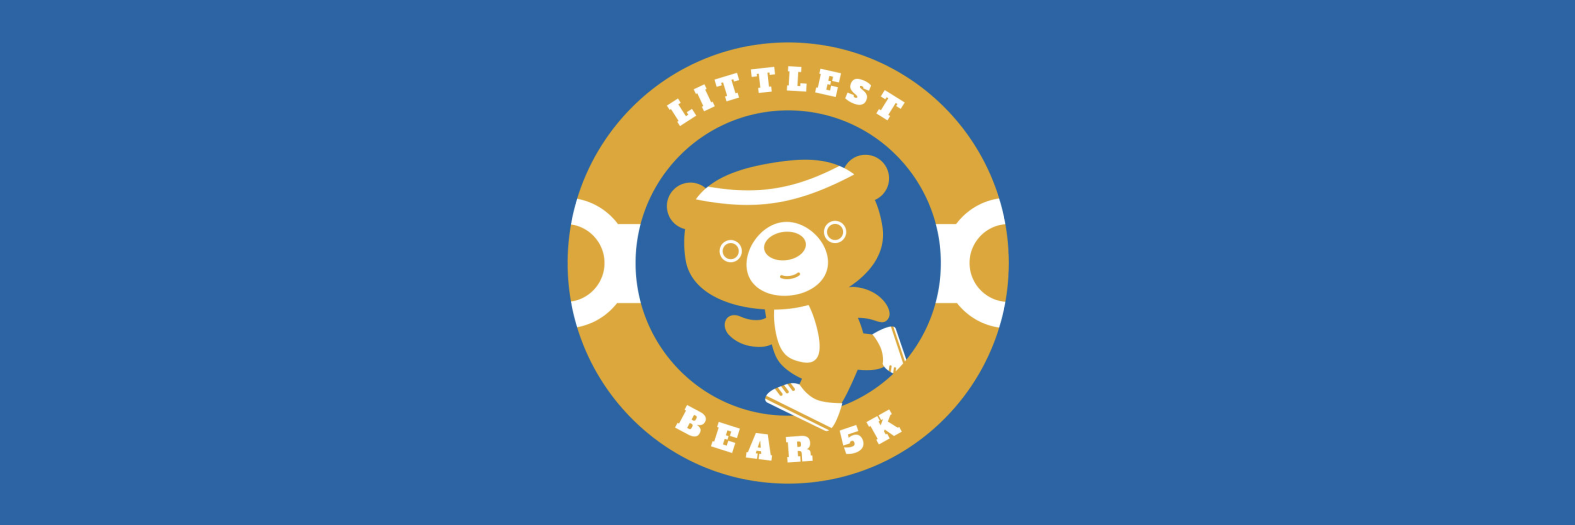 littlestbear-5k-2020-banner.png